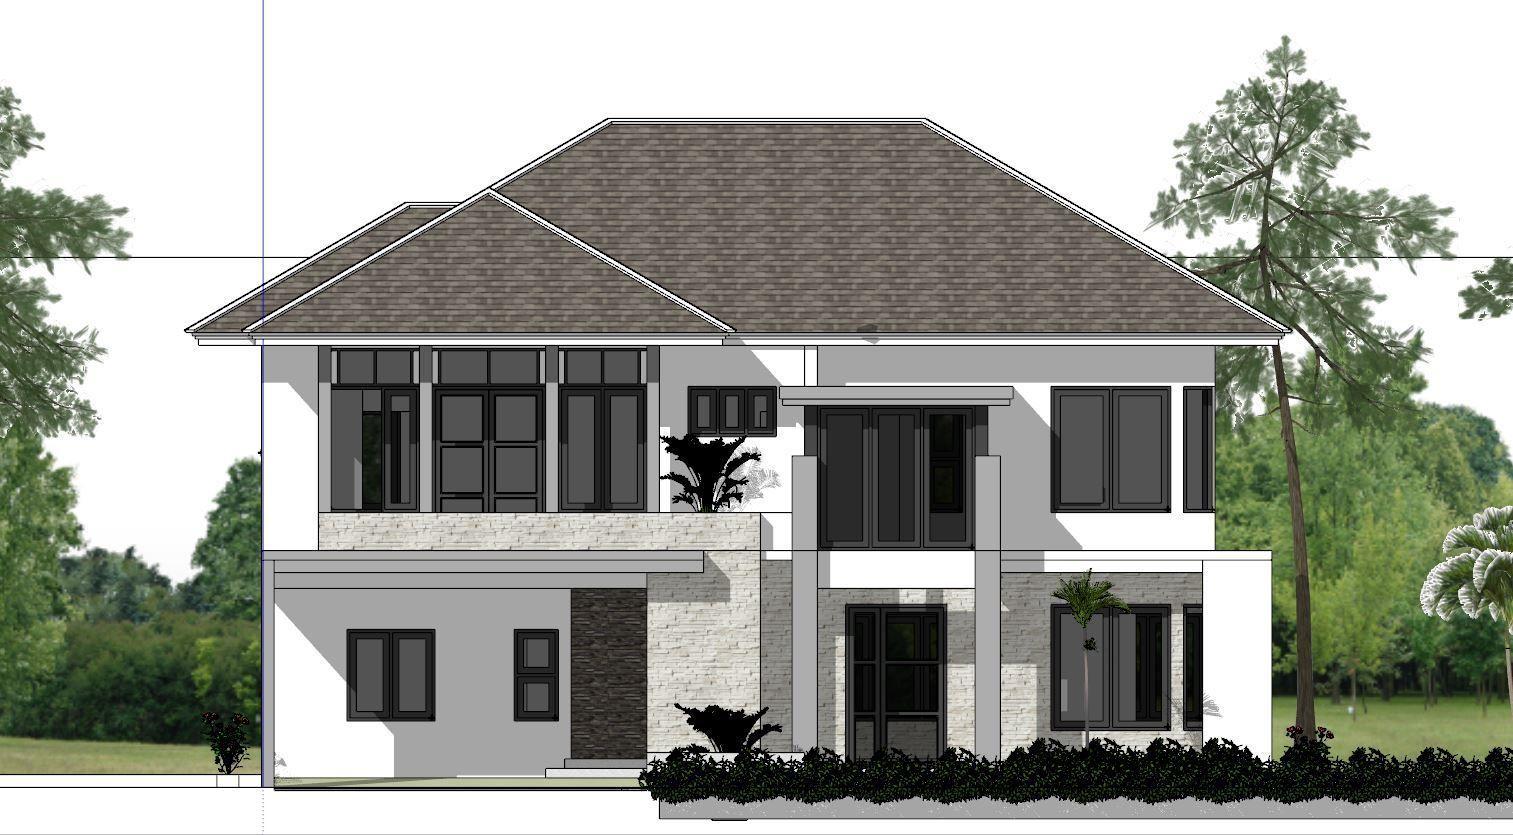 4 Bedrooms Home Design Plan Size 14x11m | Home design ...